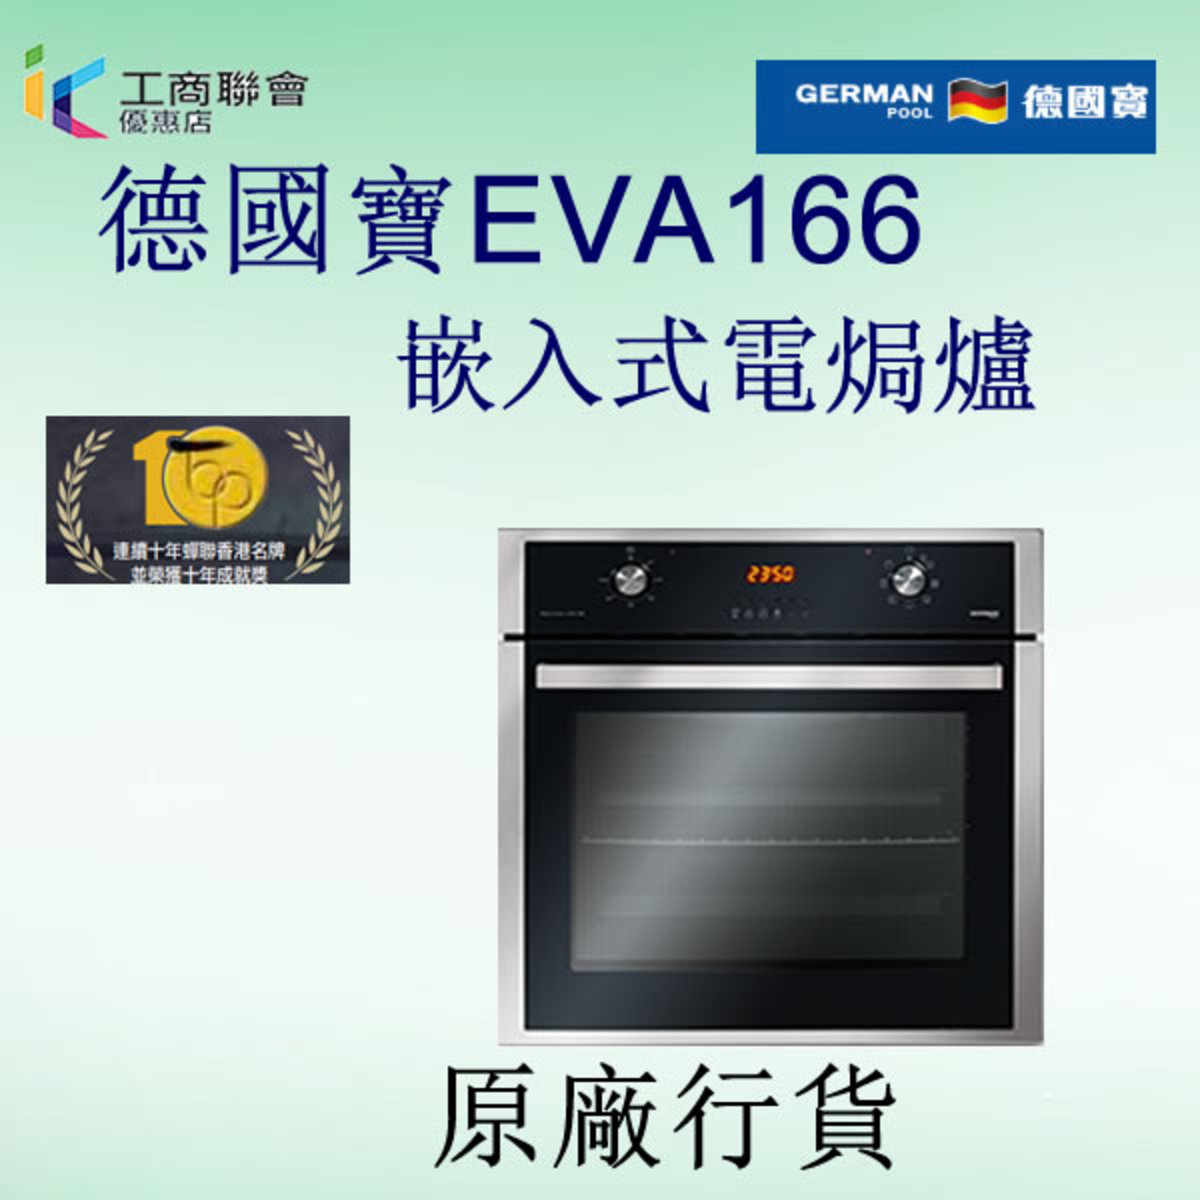 EVA166  66 L  Built-In Oven